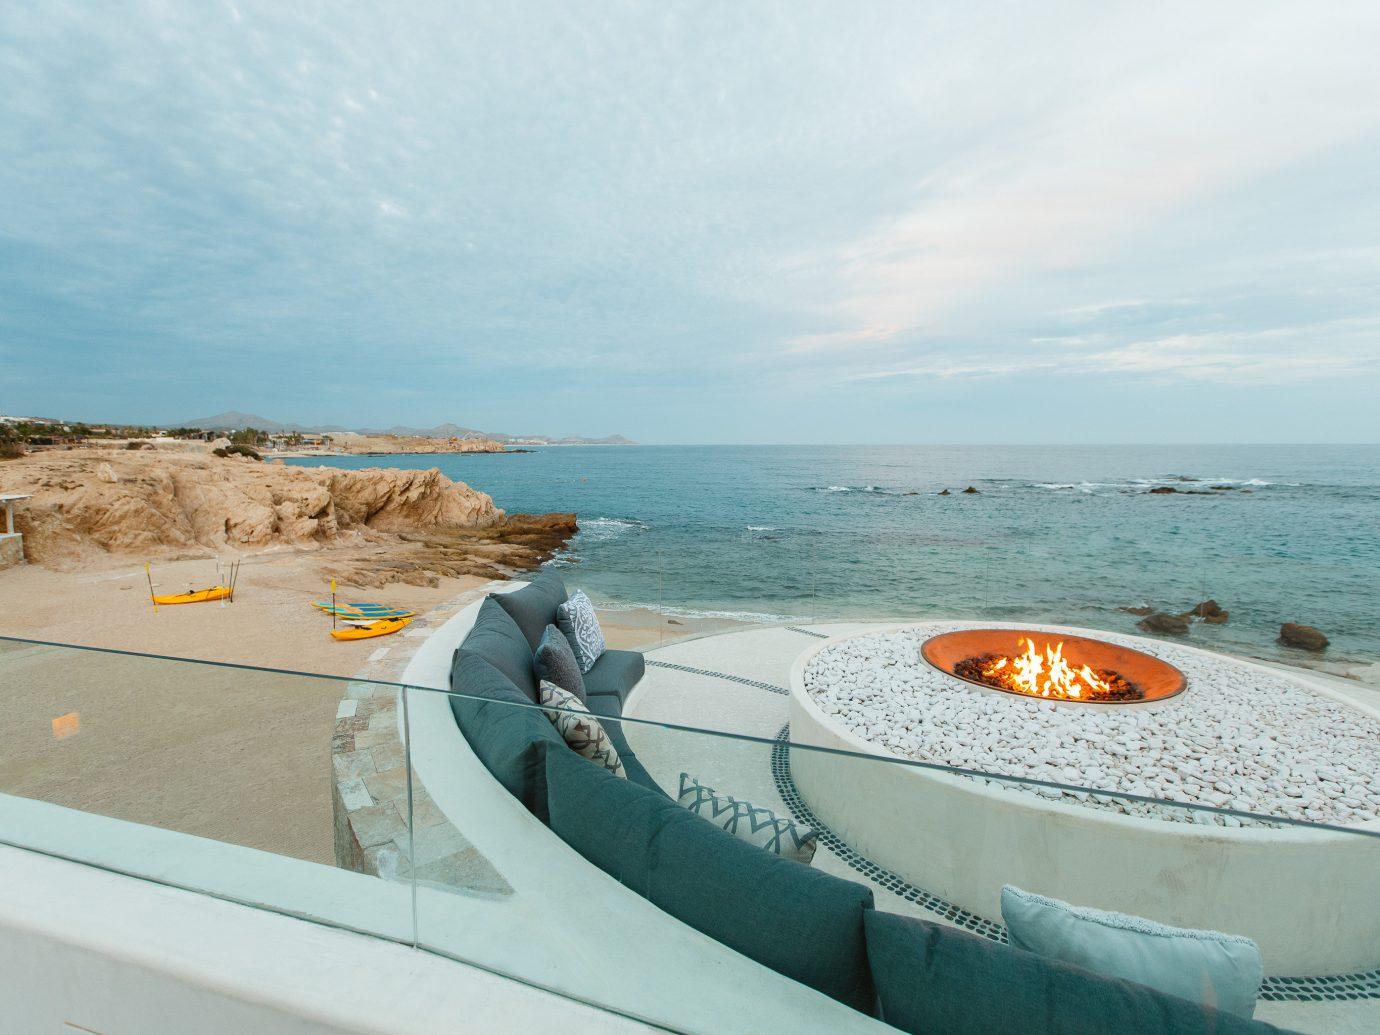 Hotels sky Sea outdoor Ocean vacation Coast shore Beach vehicle swimming pool bay Nature cape caribbean Boat counter